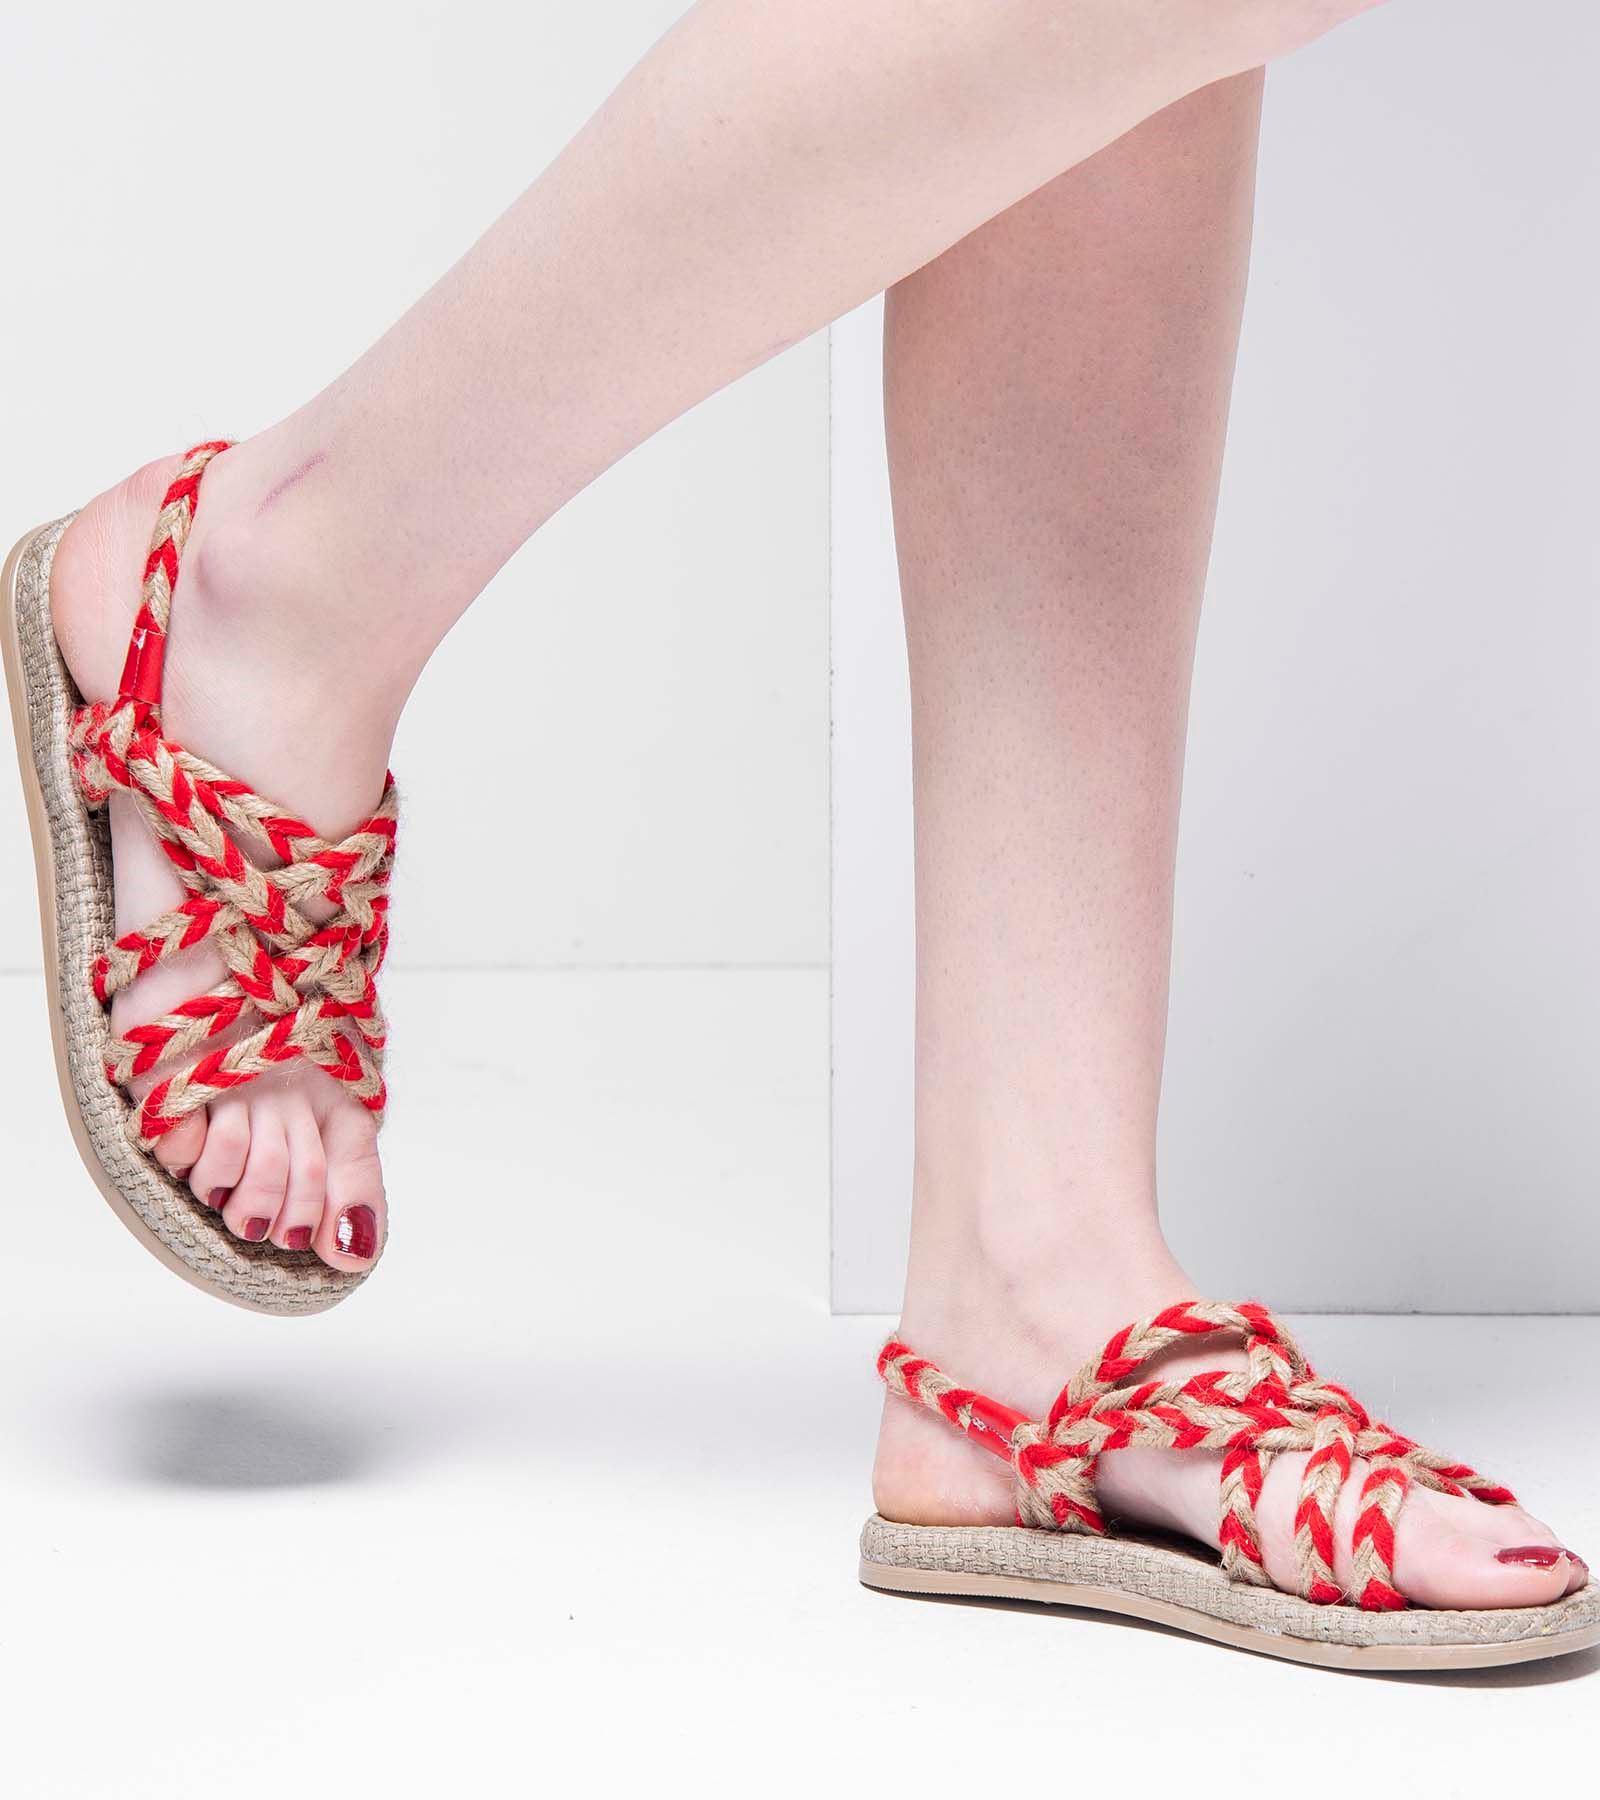 Emma Dolgu Taban Halat İpli Sandalet Kırmızı